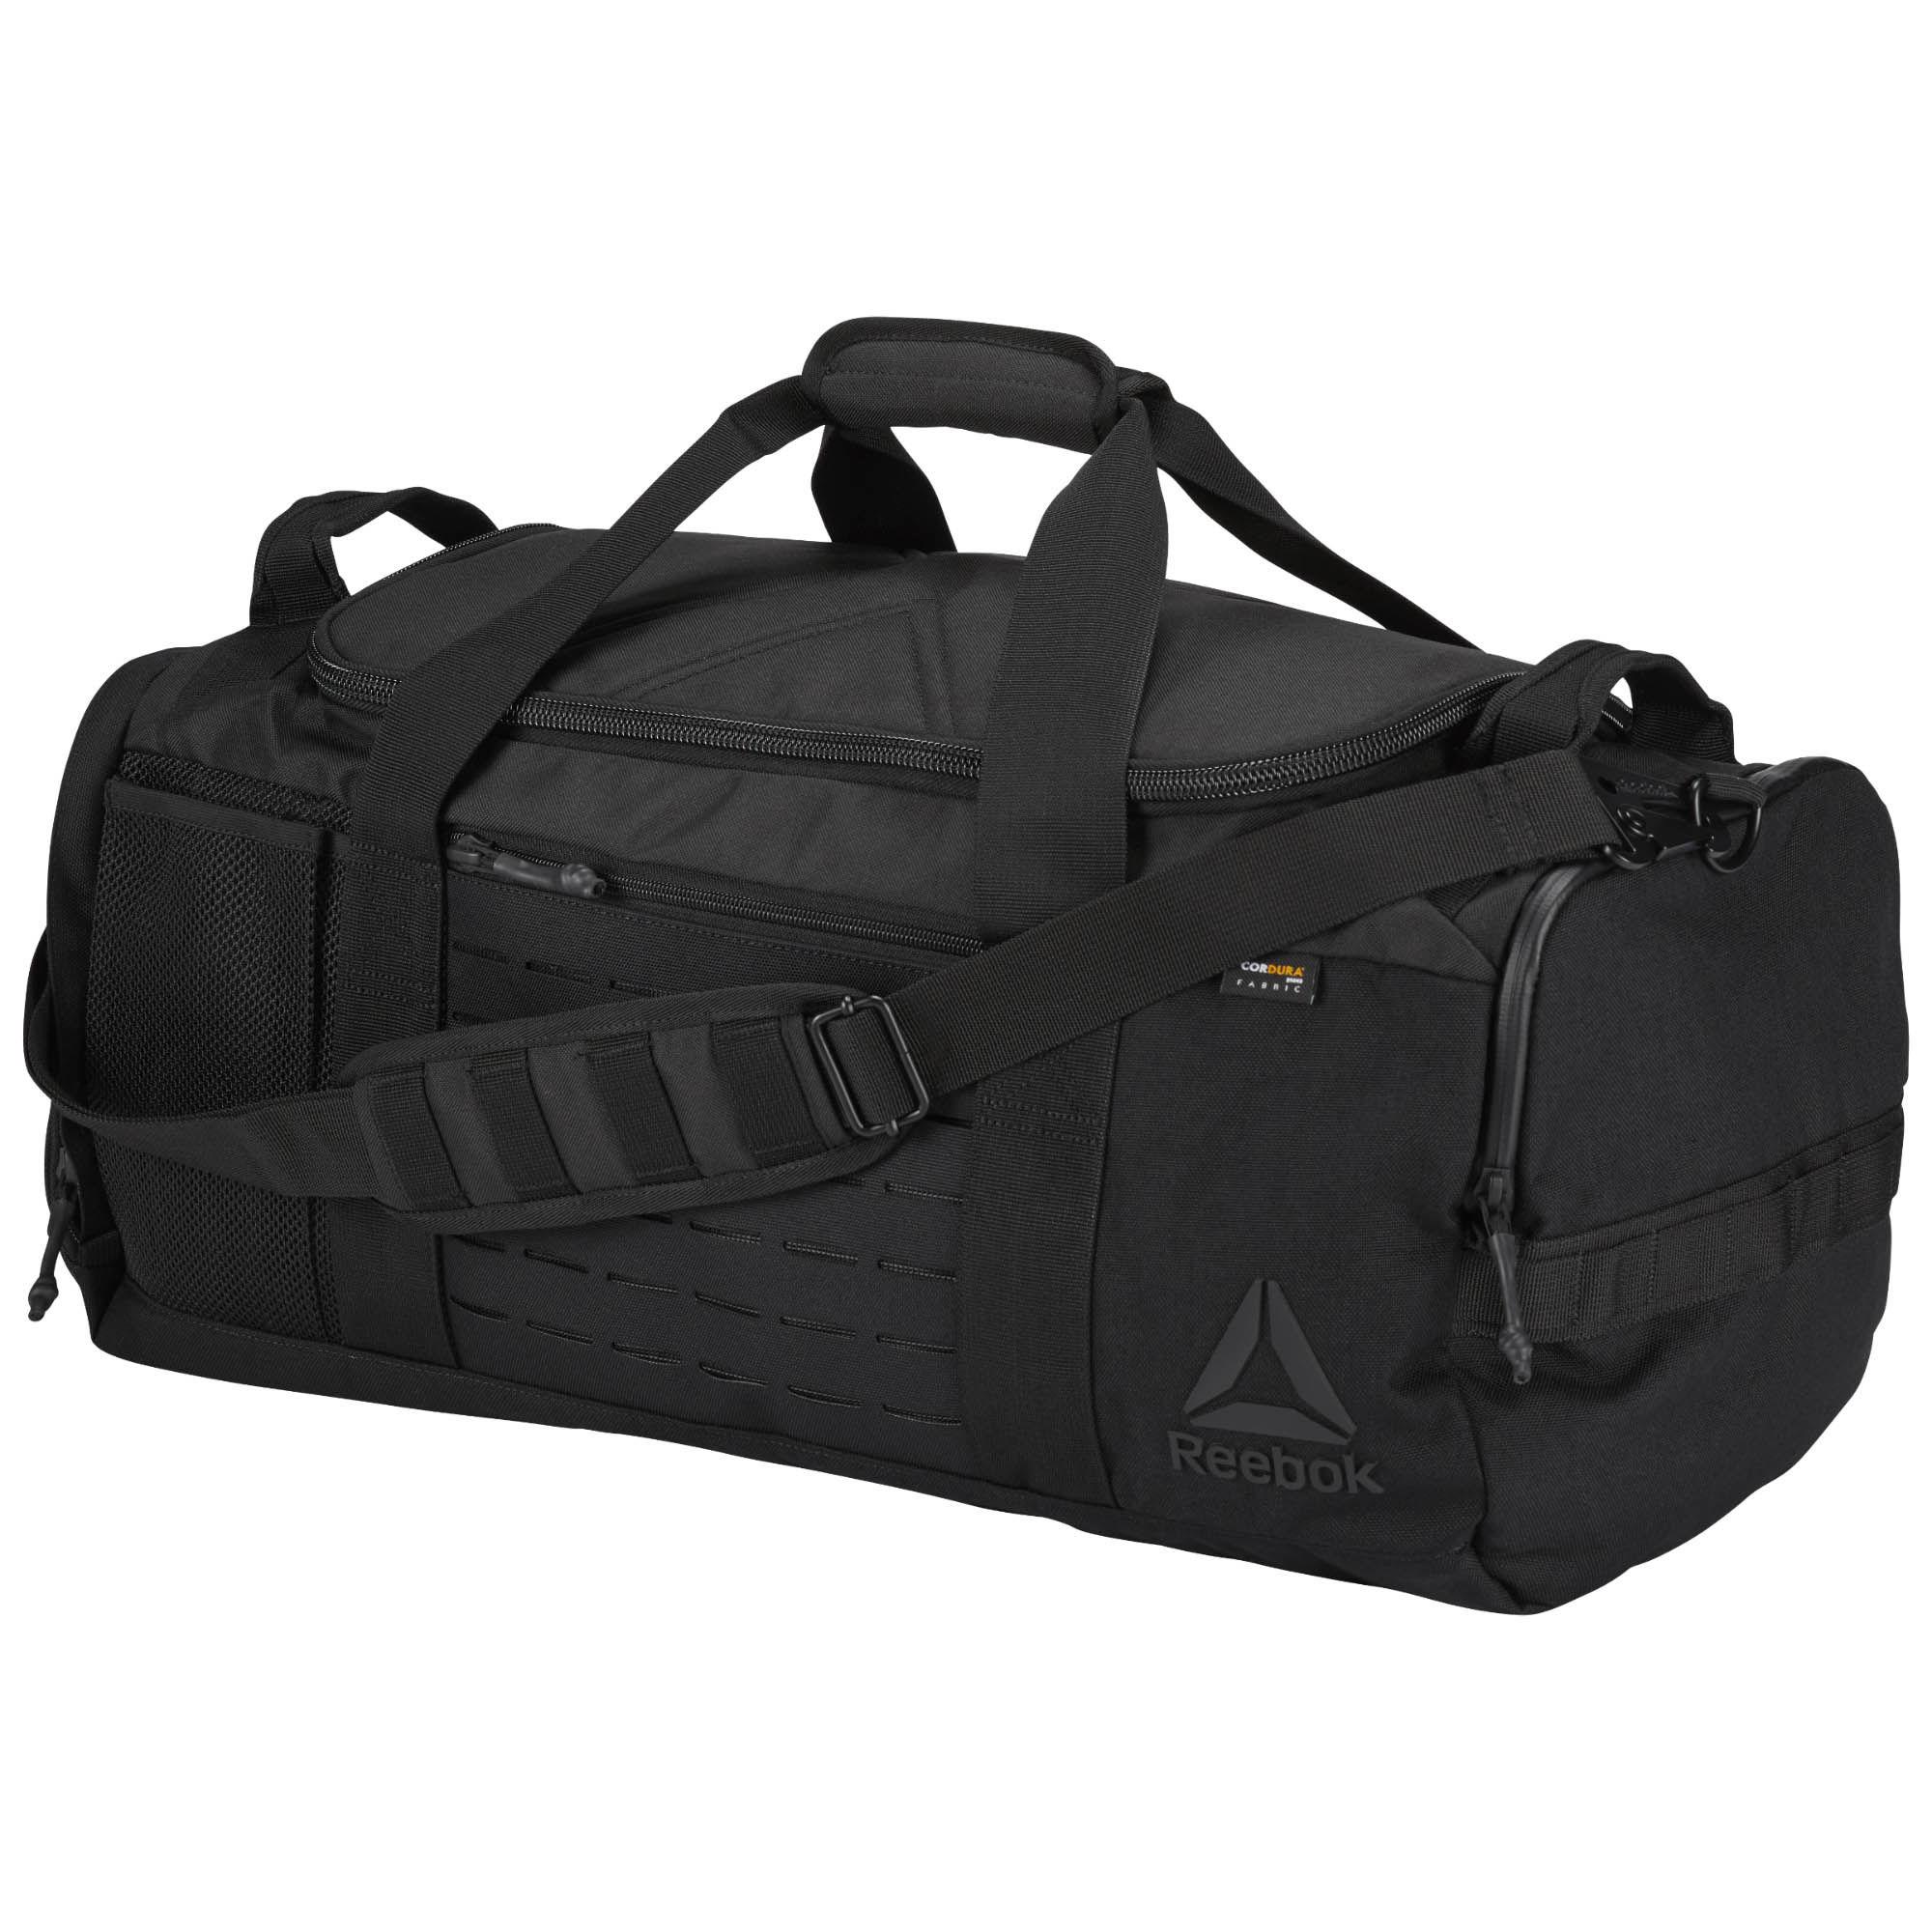 e7dc7c30cbf9 Спортивная сумка Reebok CrossFit Grab-and-Go ТренировкиCD7261 ...